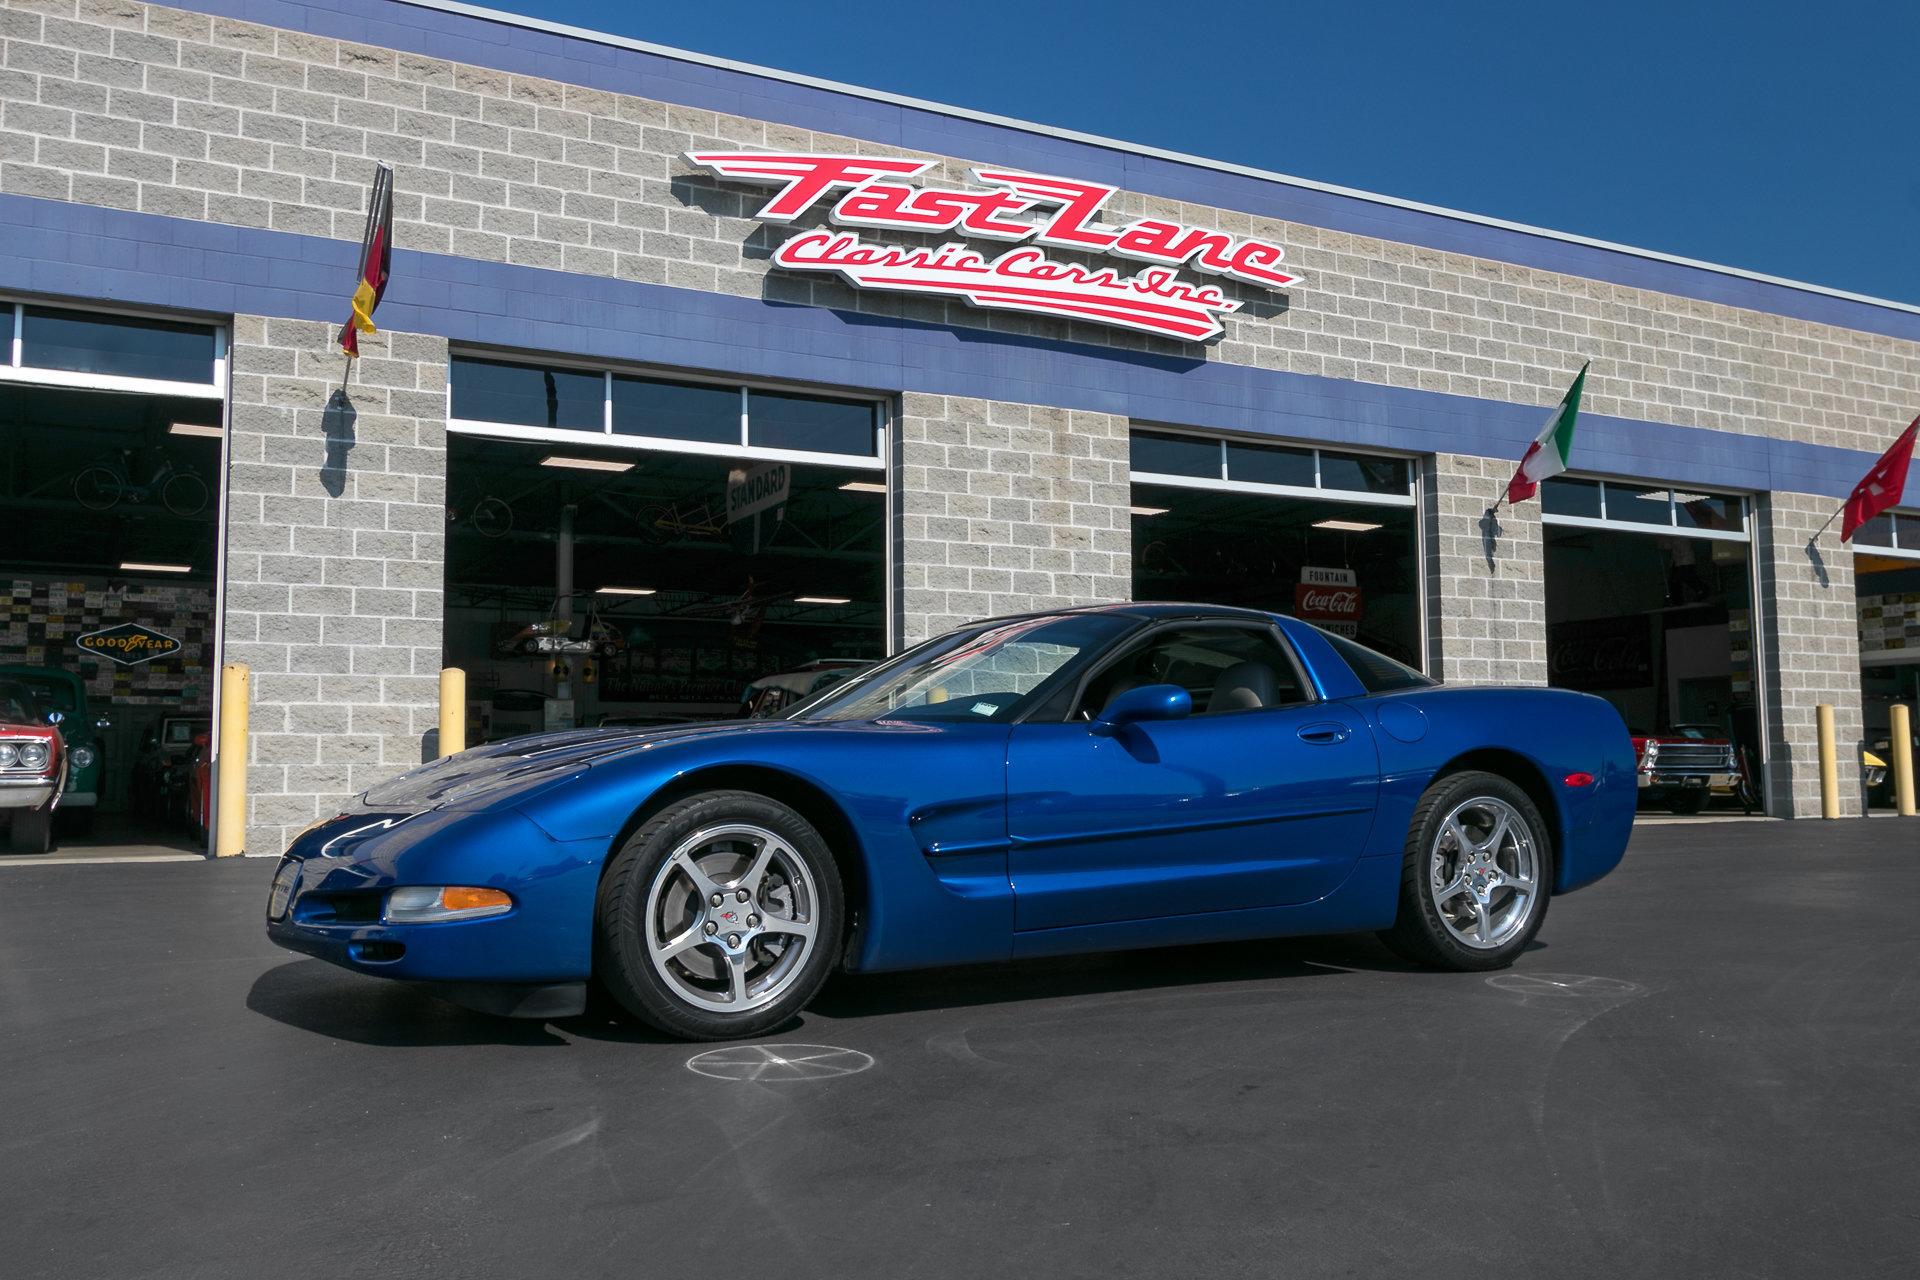 663141e12f5d3 hd 2002 chevrolet corvette